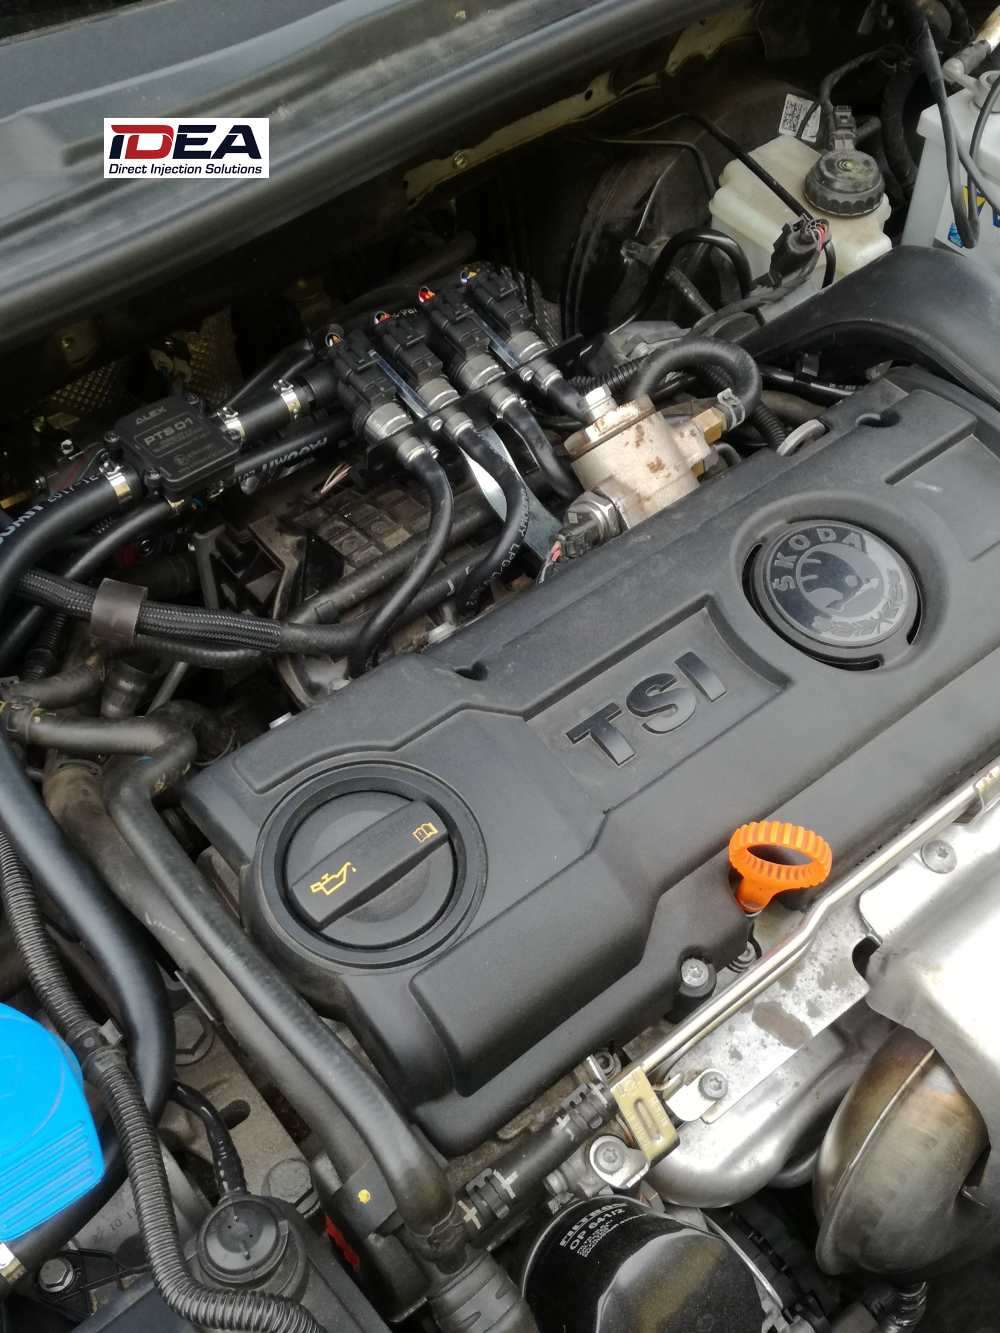 Škoda Roomster 1.2 TSI na LPG se systémem IDEA DI